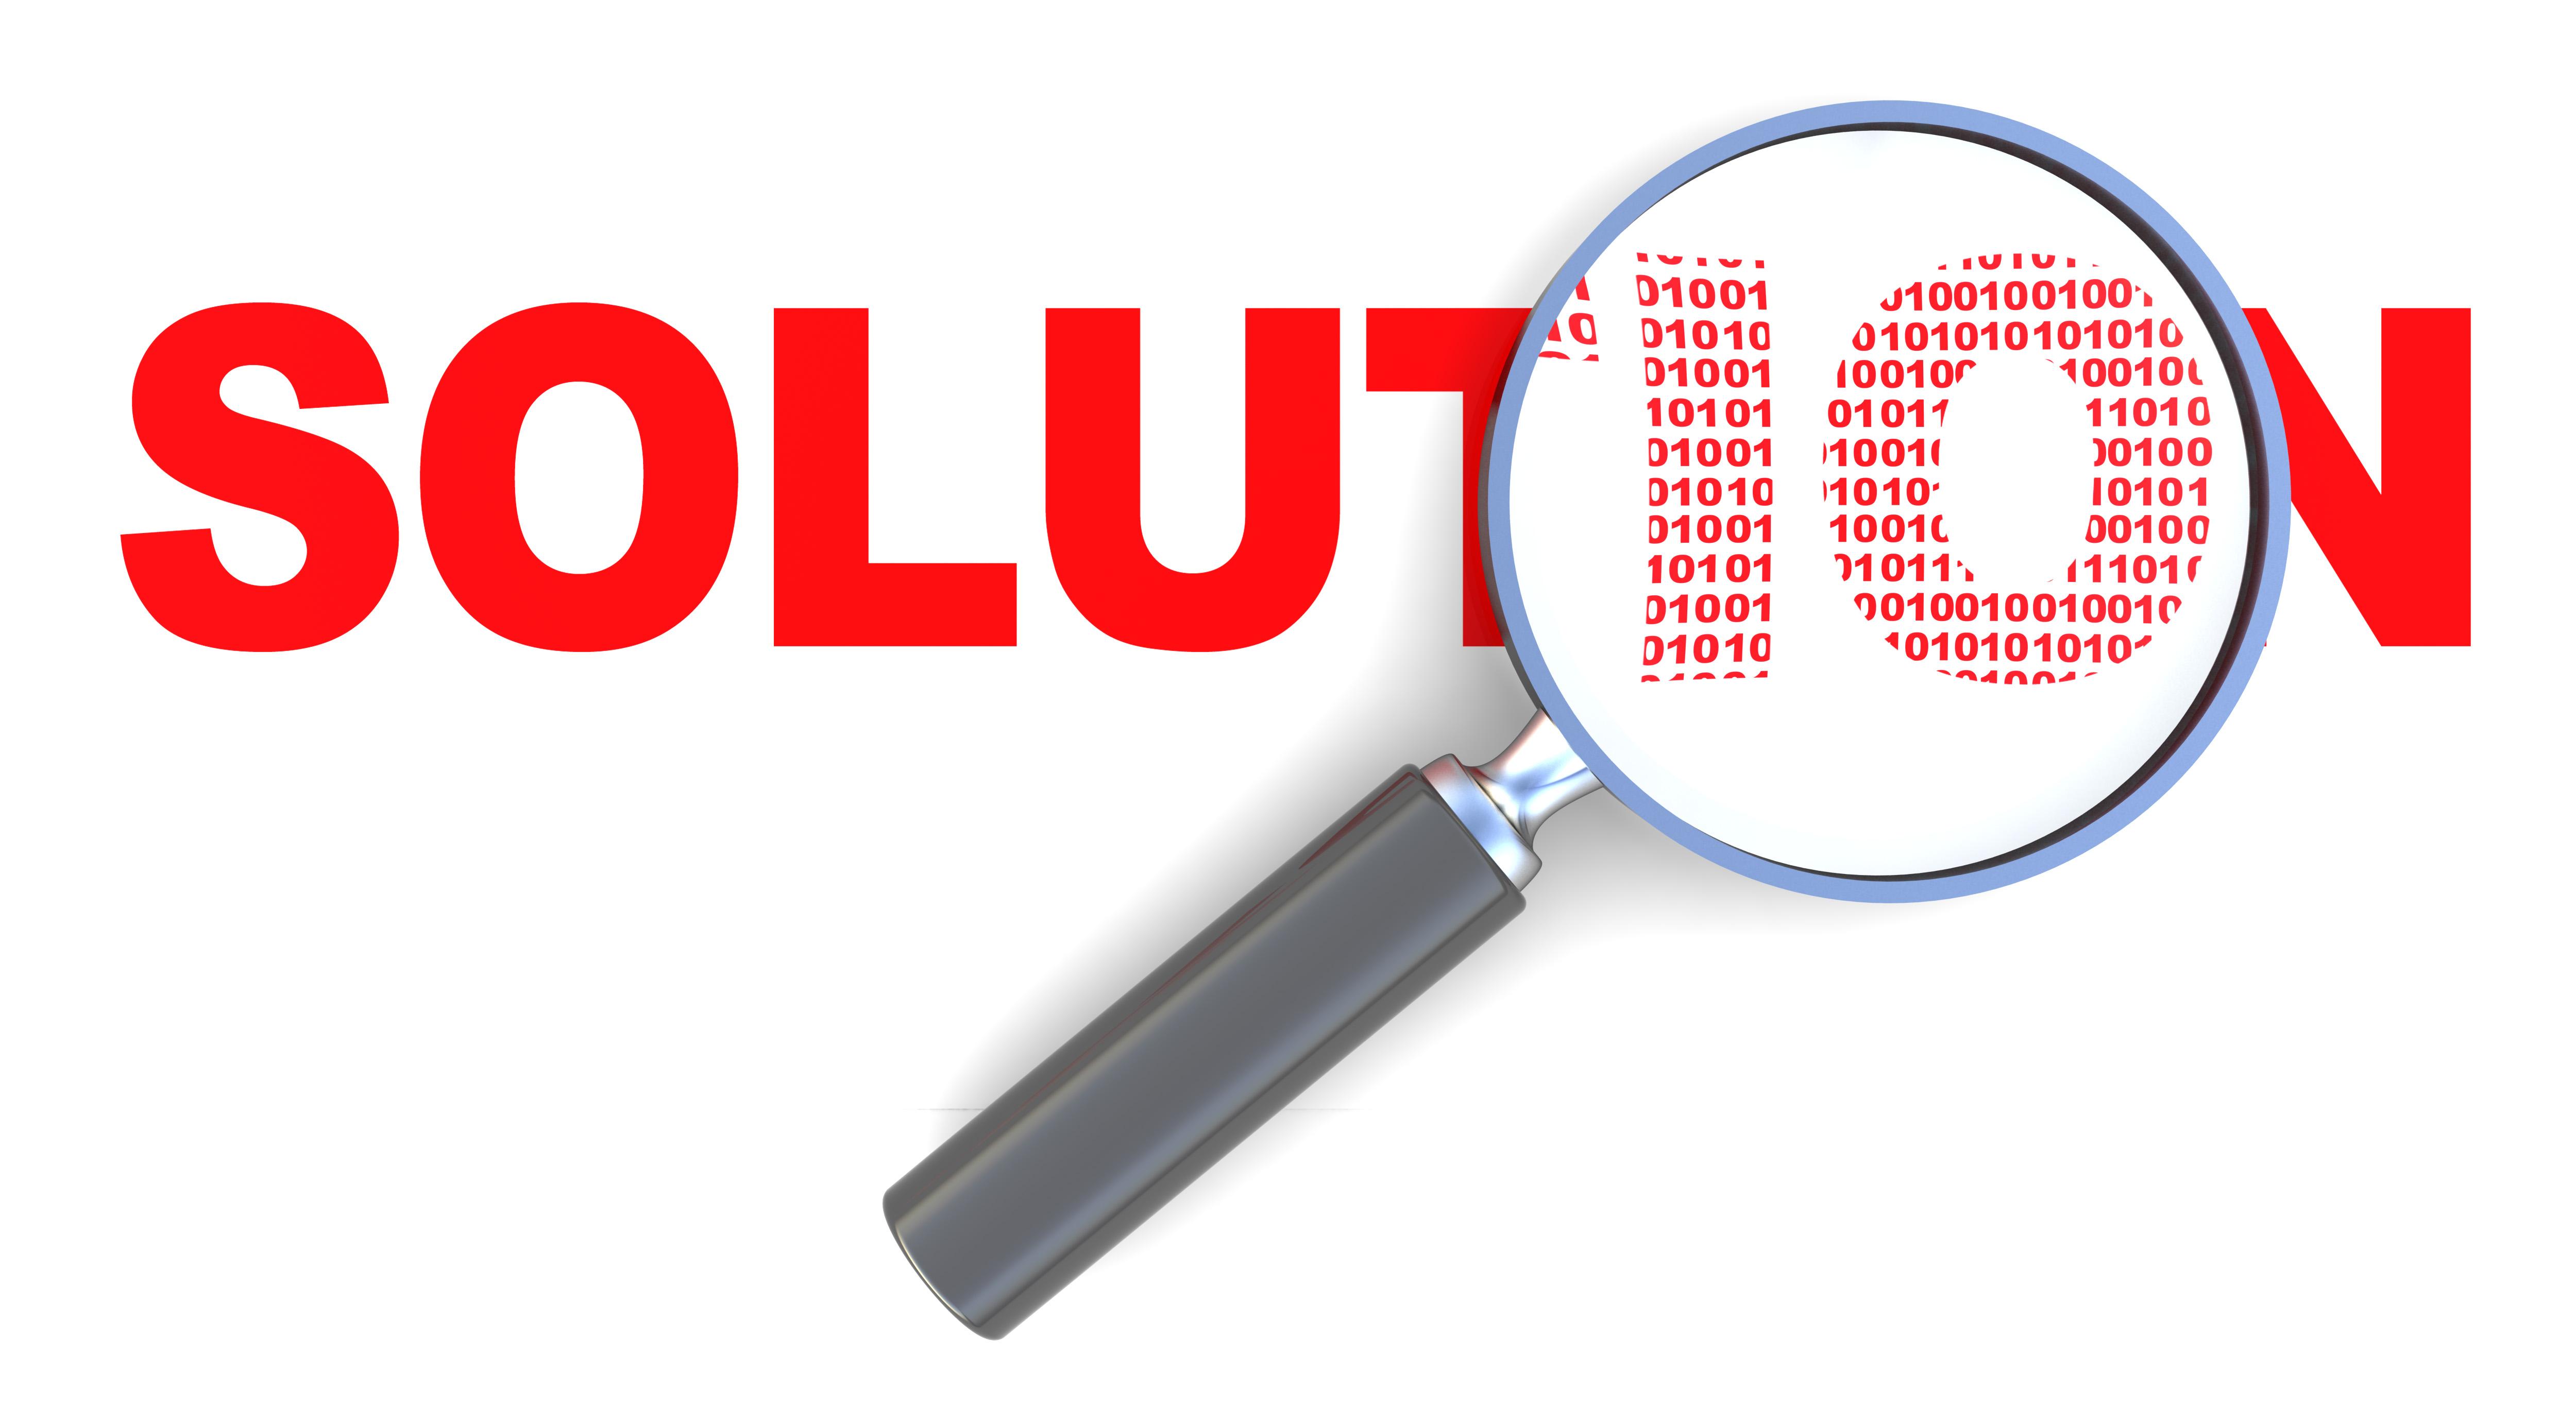 Software clipart focused Focused program CIMx will your